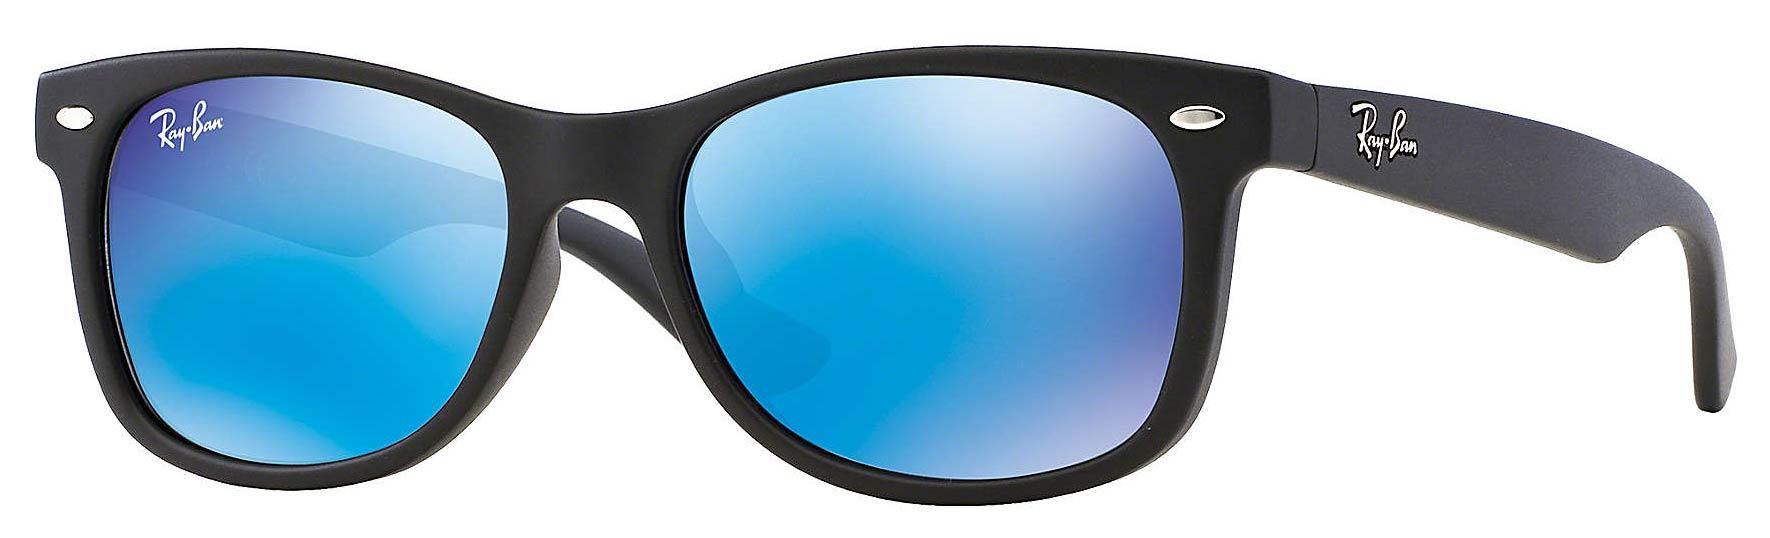 lunettes de soleil ray ban rj9052s new wayfarer